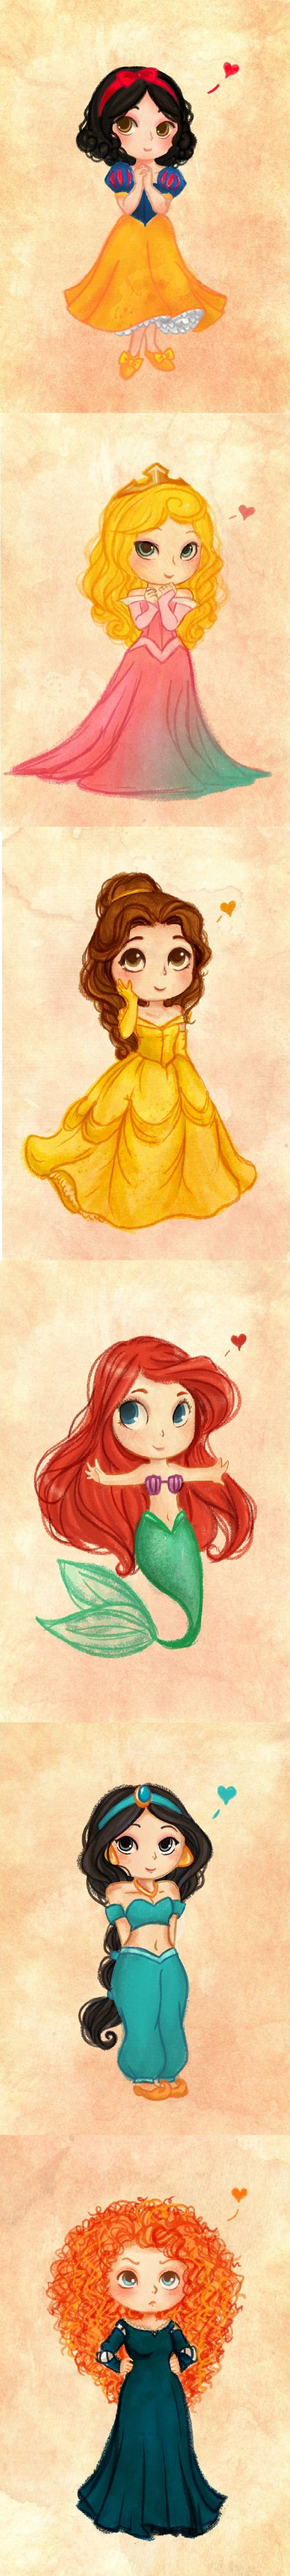 Princesses by Natalia Fanchini